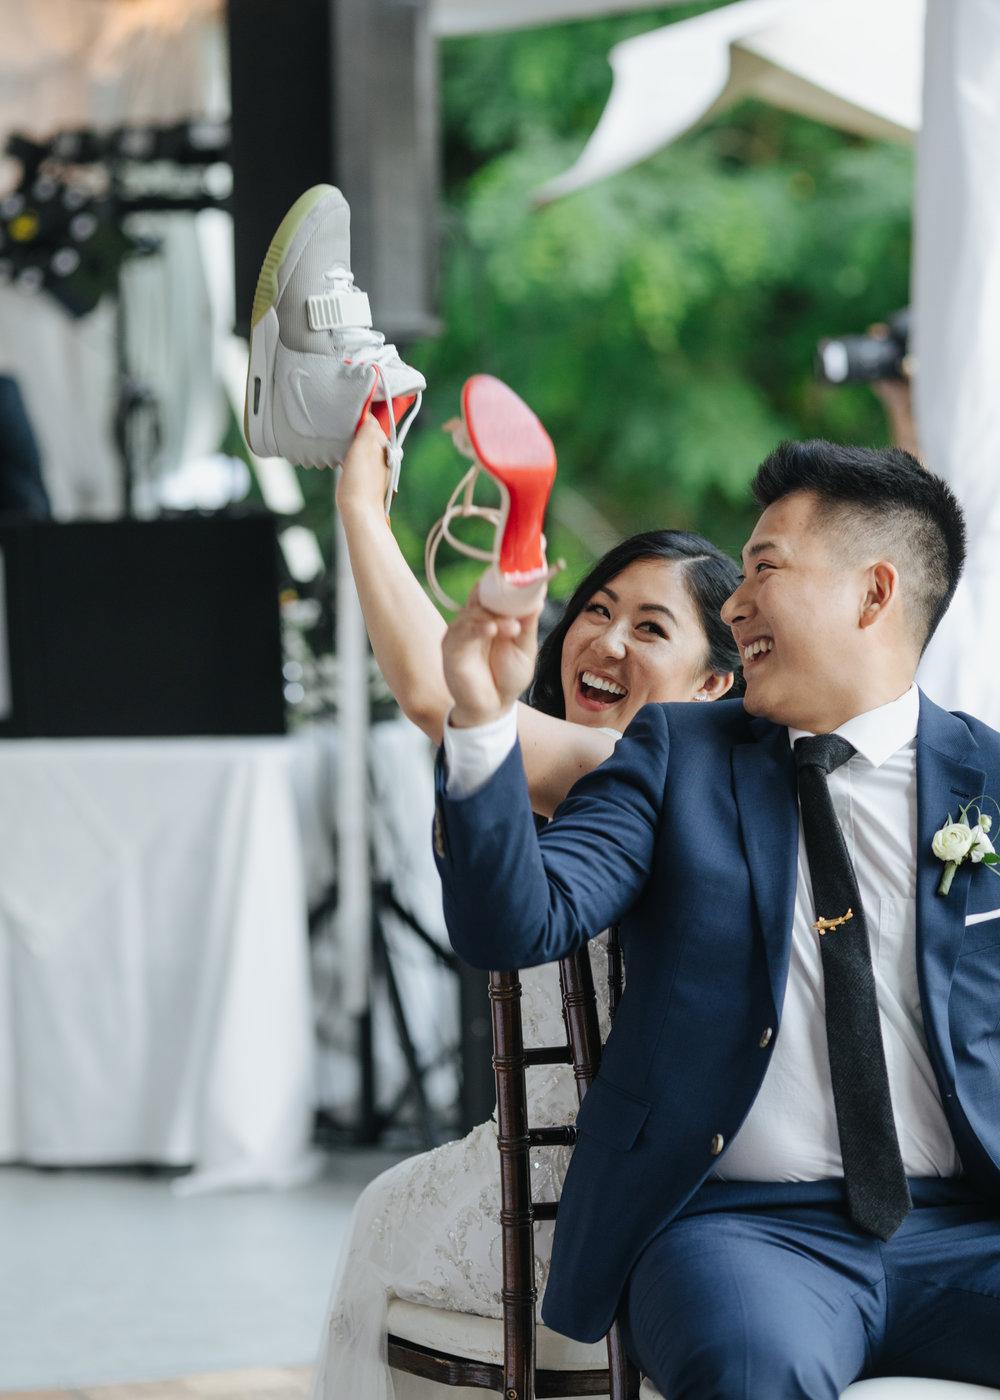 herastudios_wedding_tracy_kyley_hera_selects-81.jpg